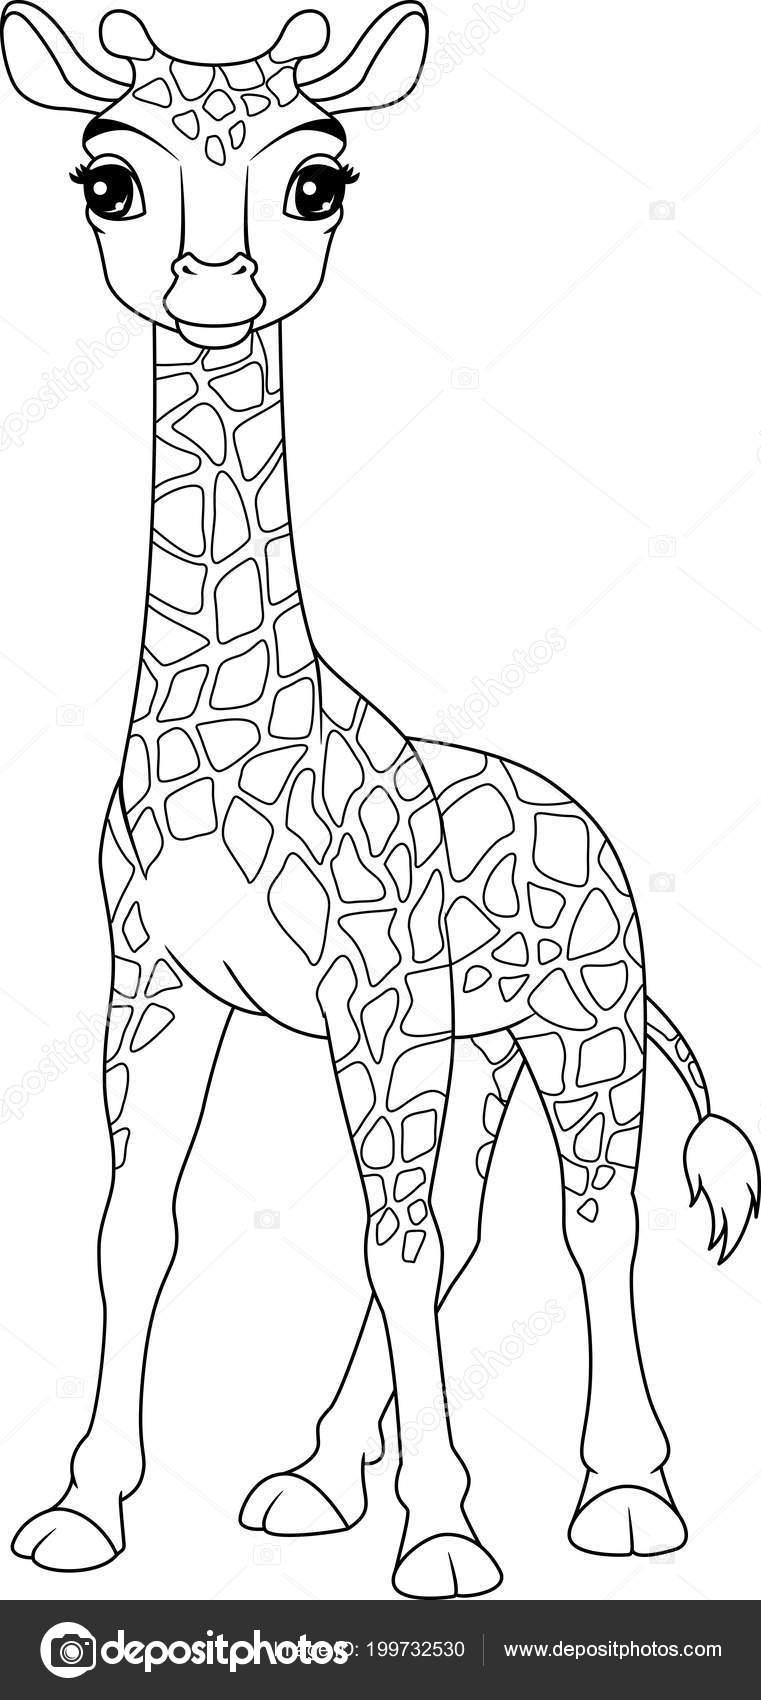 Image Cartoon Giraffe Coloring Page Stock Vector C Malyaka 199732530